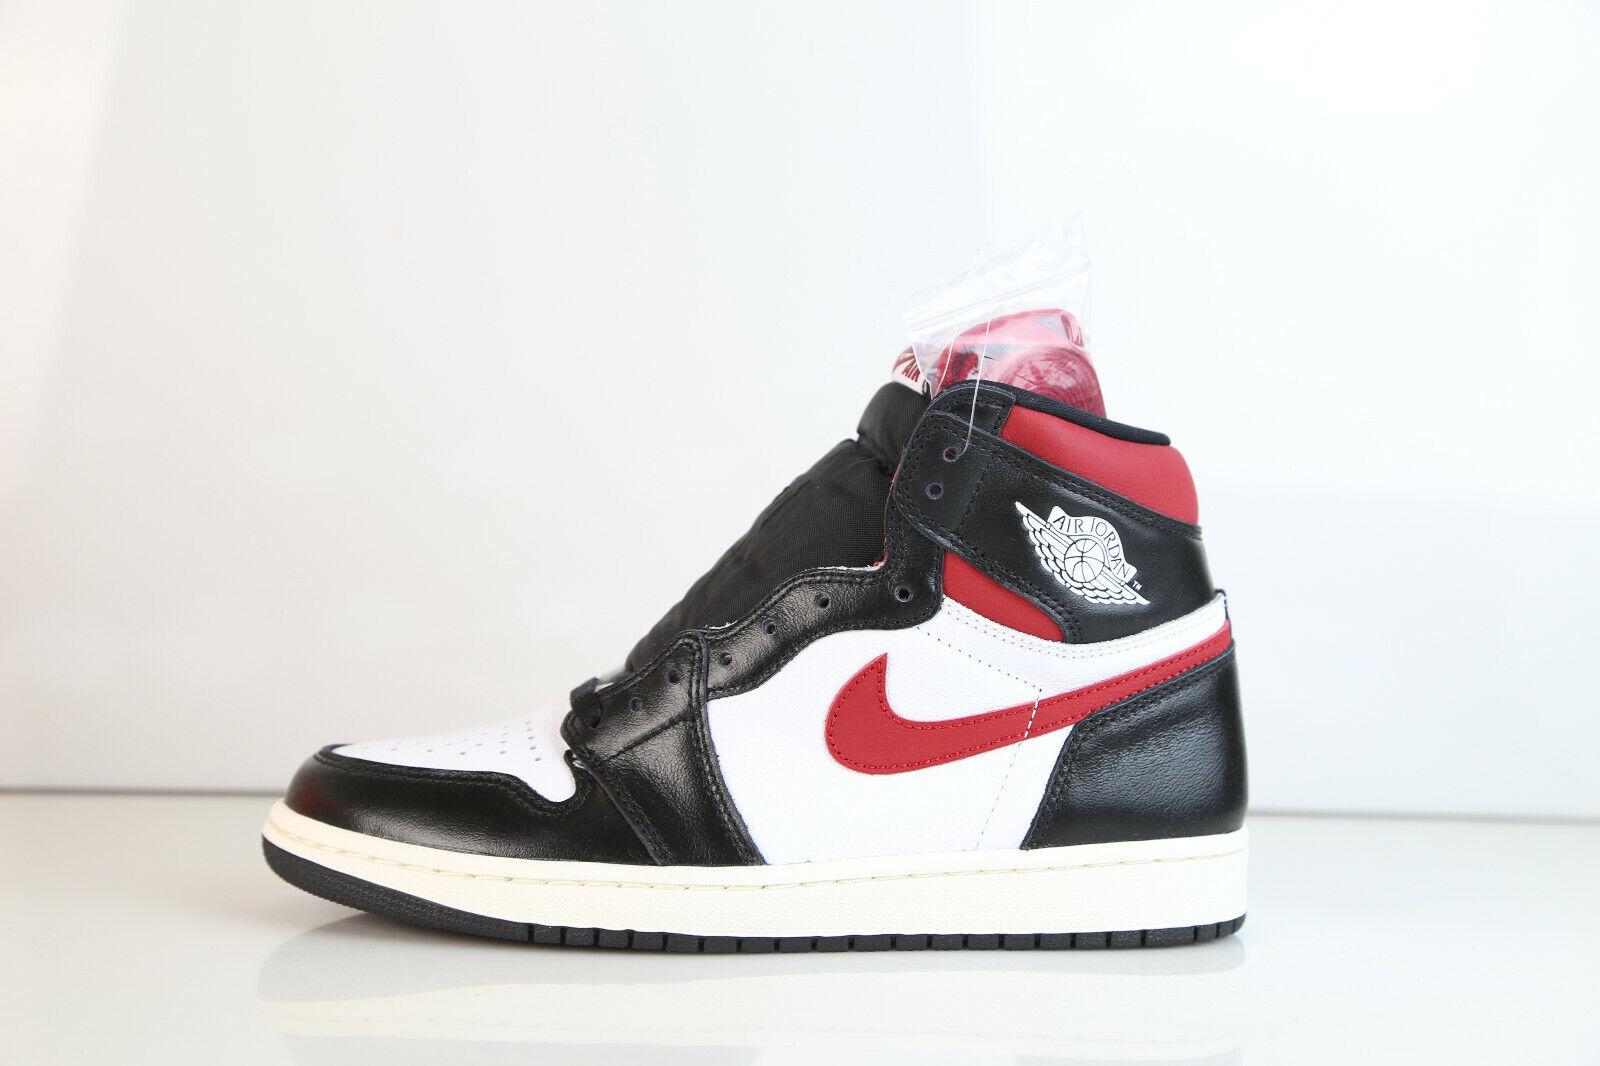 reputable site b4bd0 cb592 Nike Air Jordan Retro 1 High OG Black White Sail Gym Red 555088-061 7-15